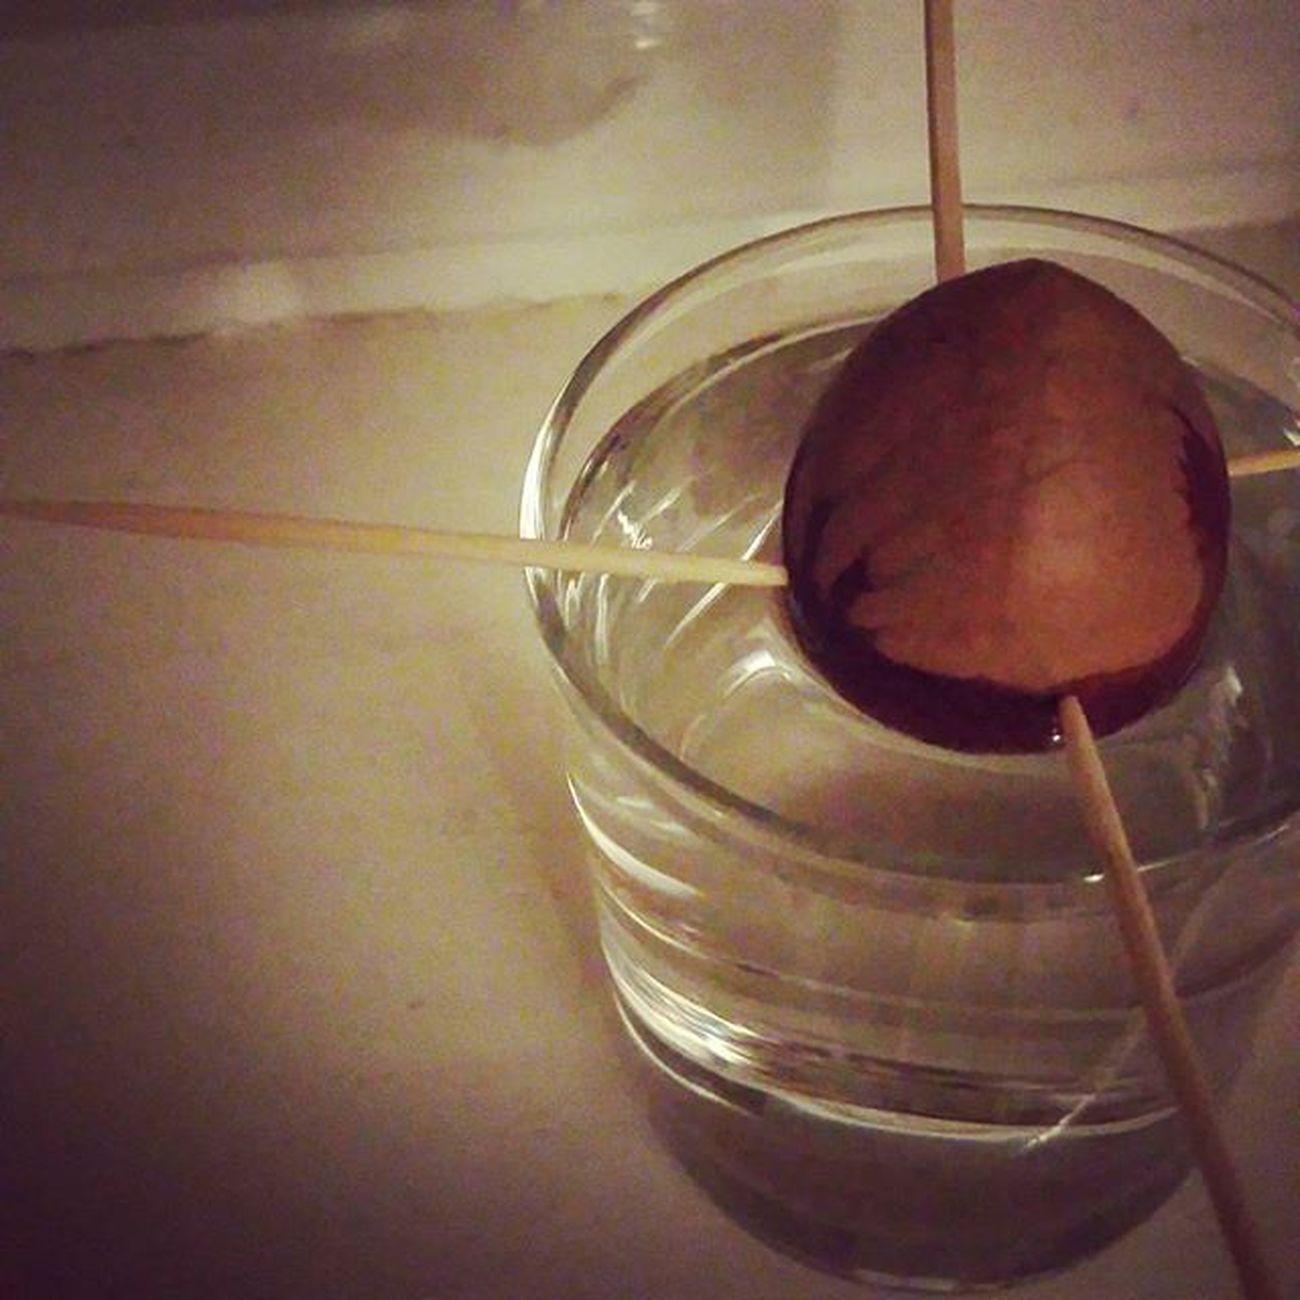 Avokado 🌱 Iamalittlefarmer Plant Avocado Vstavejseminkoholala Zatimjenpecka